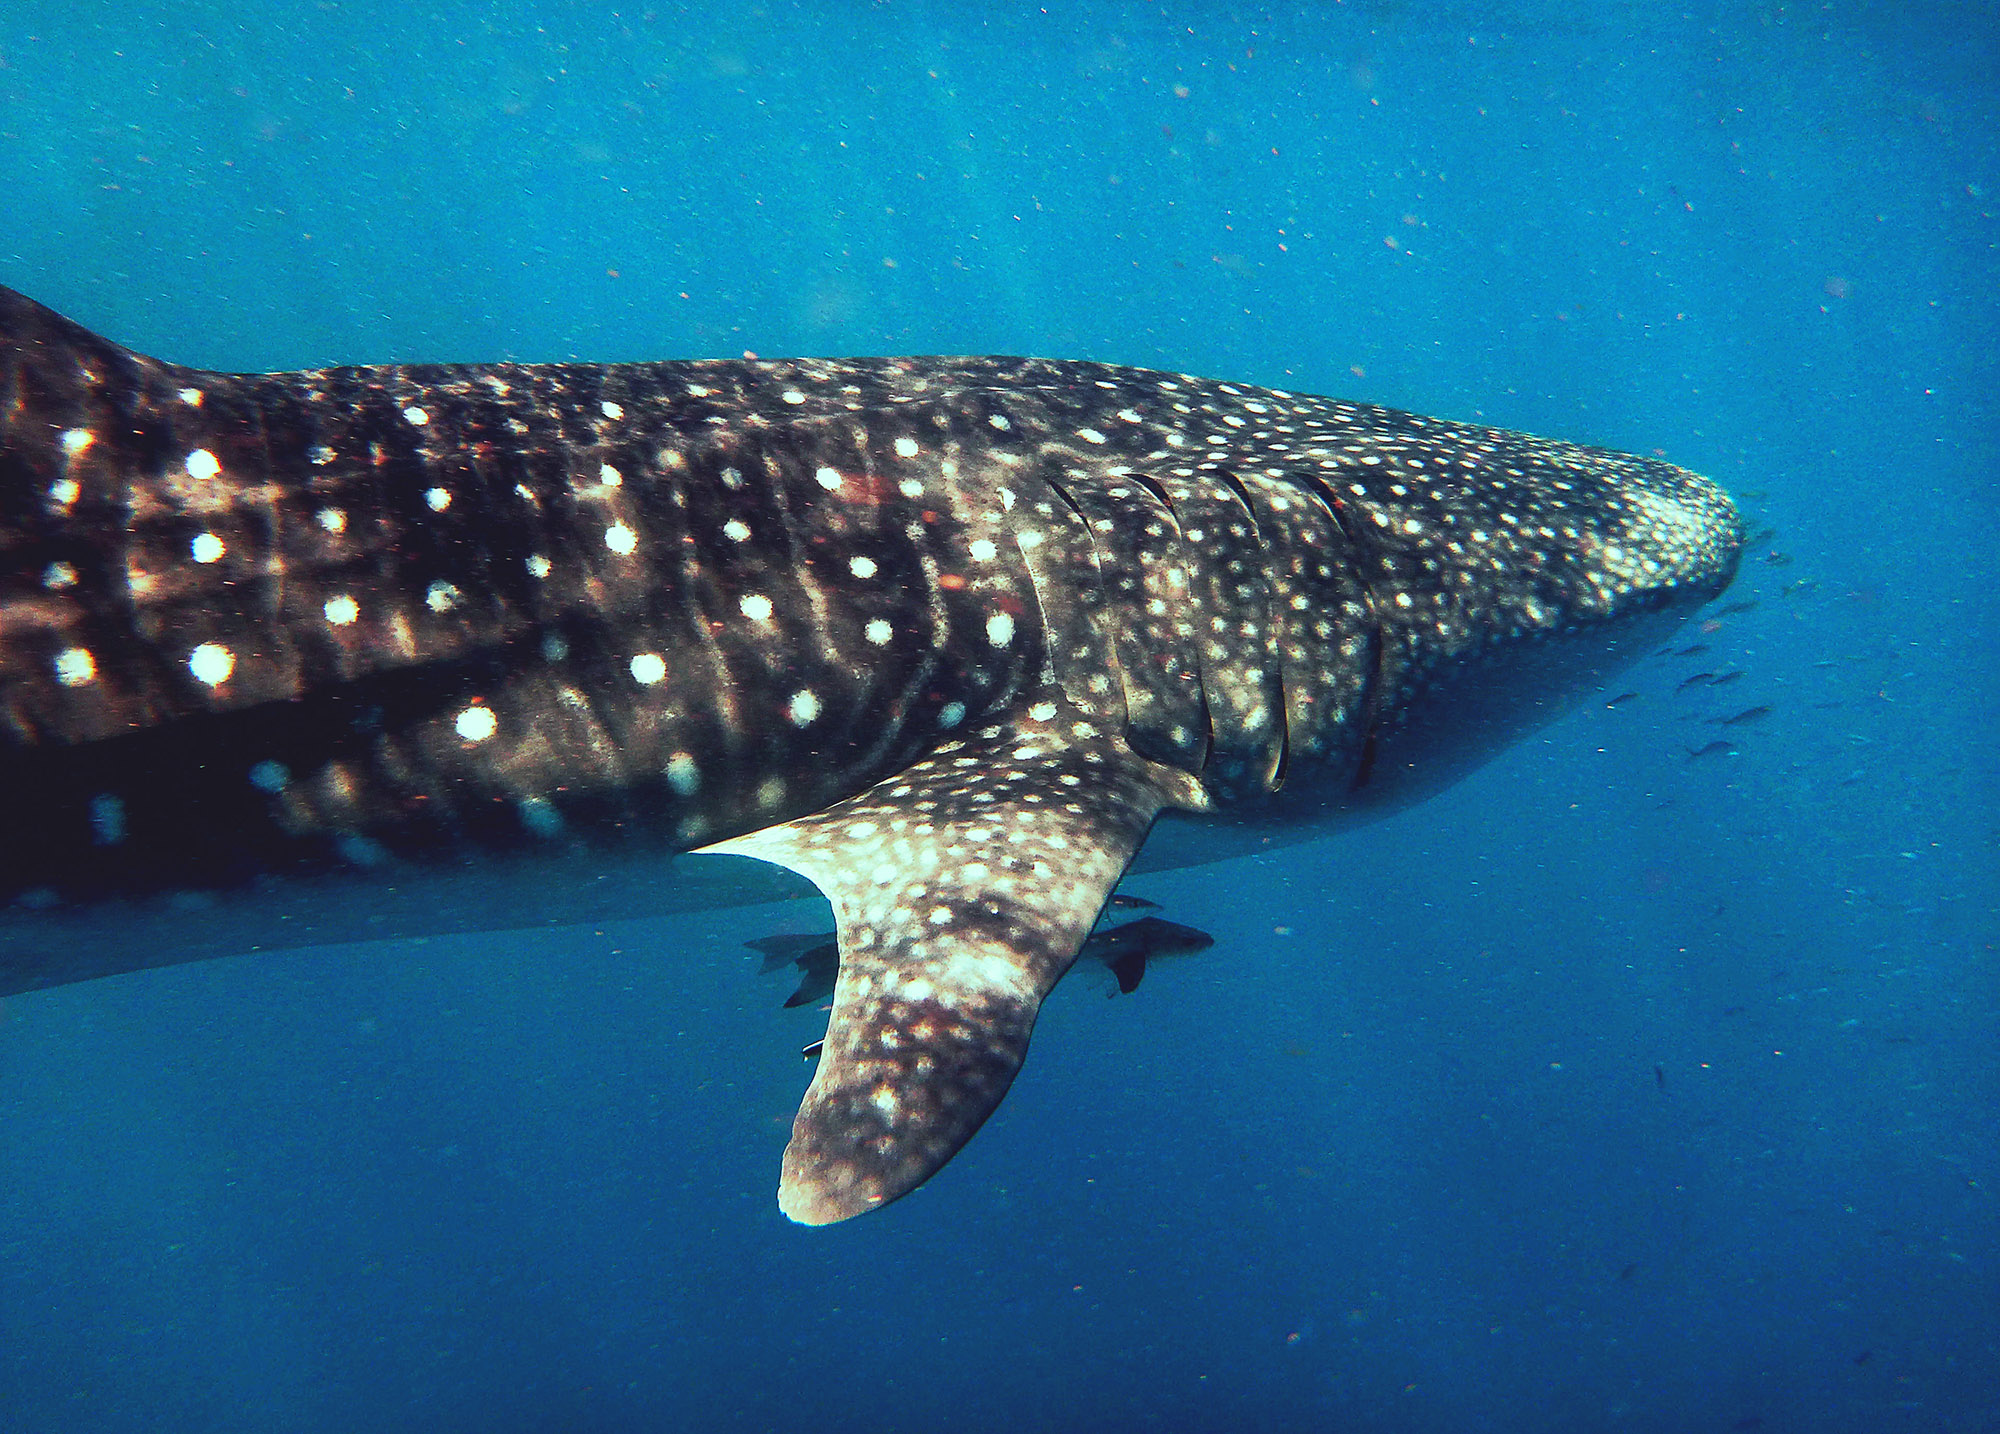 A whaleshark, ningaloo reef, Australia